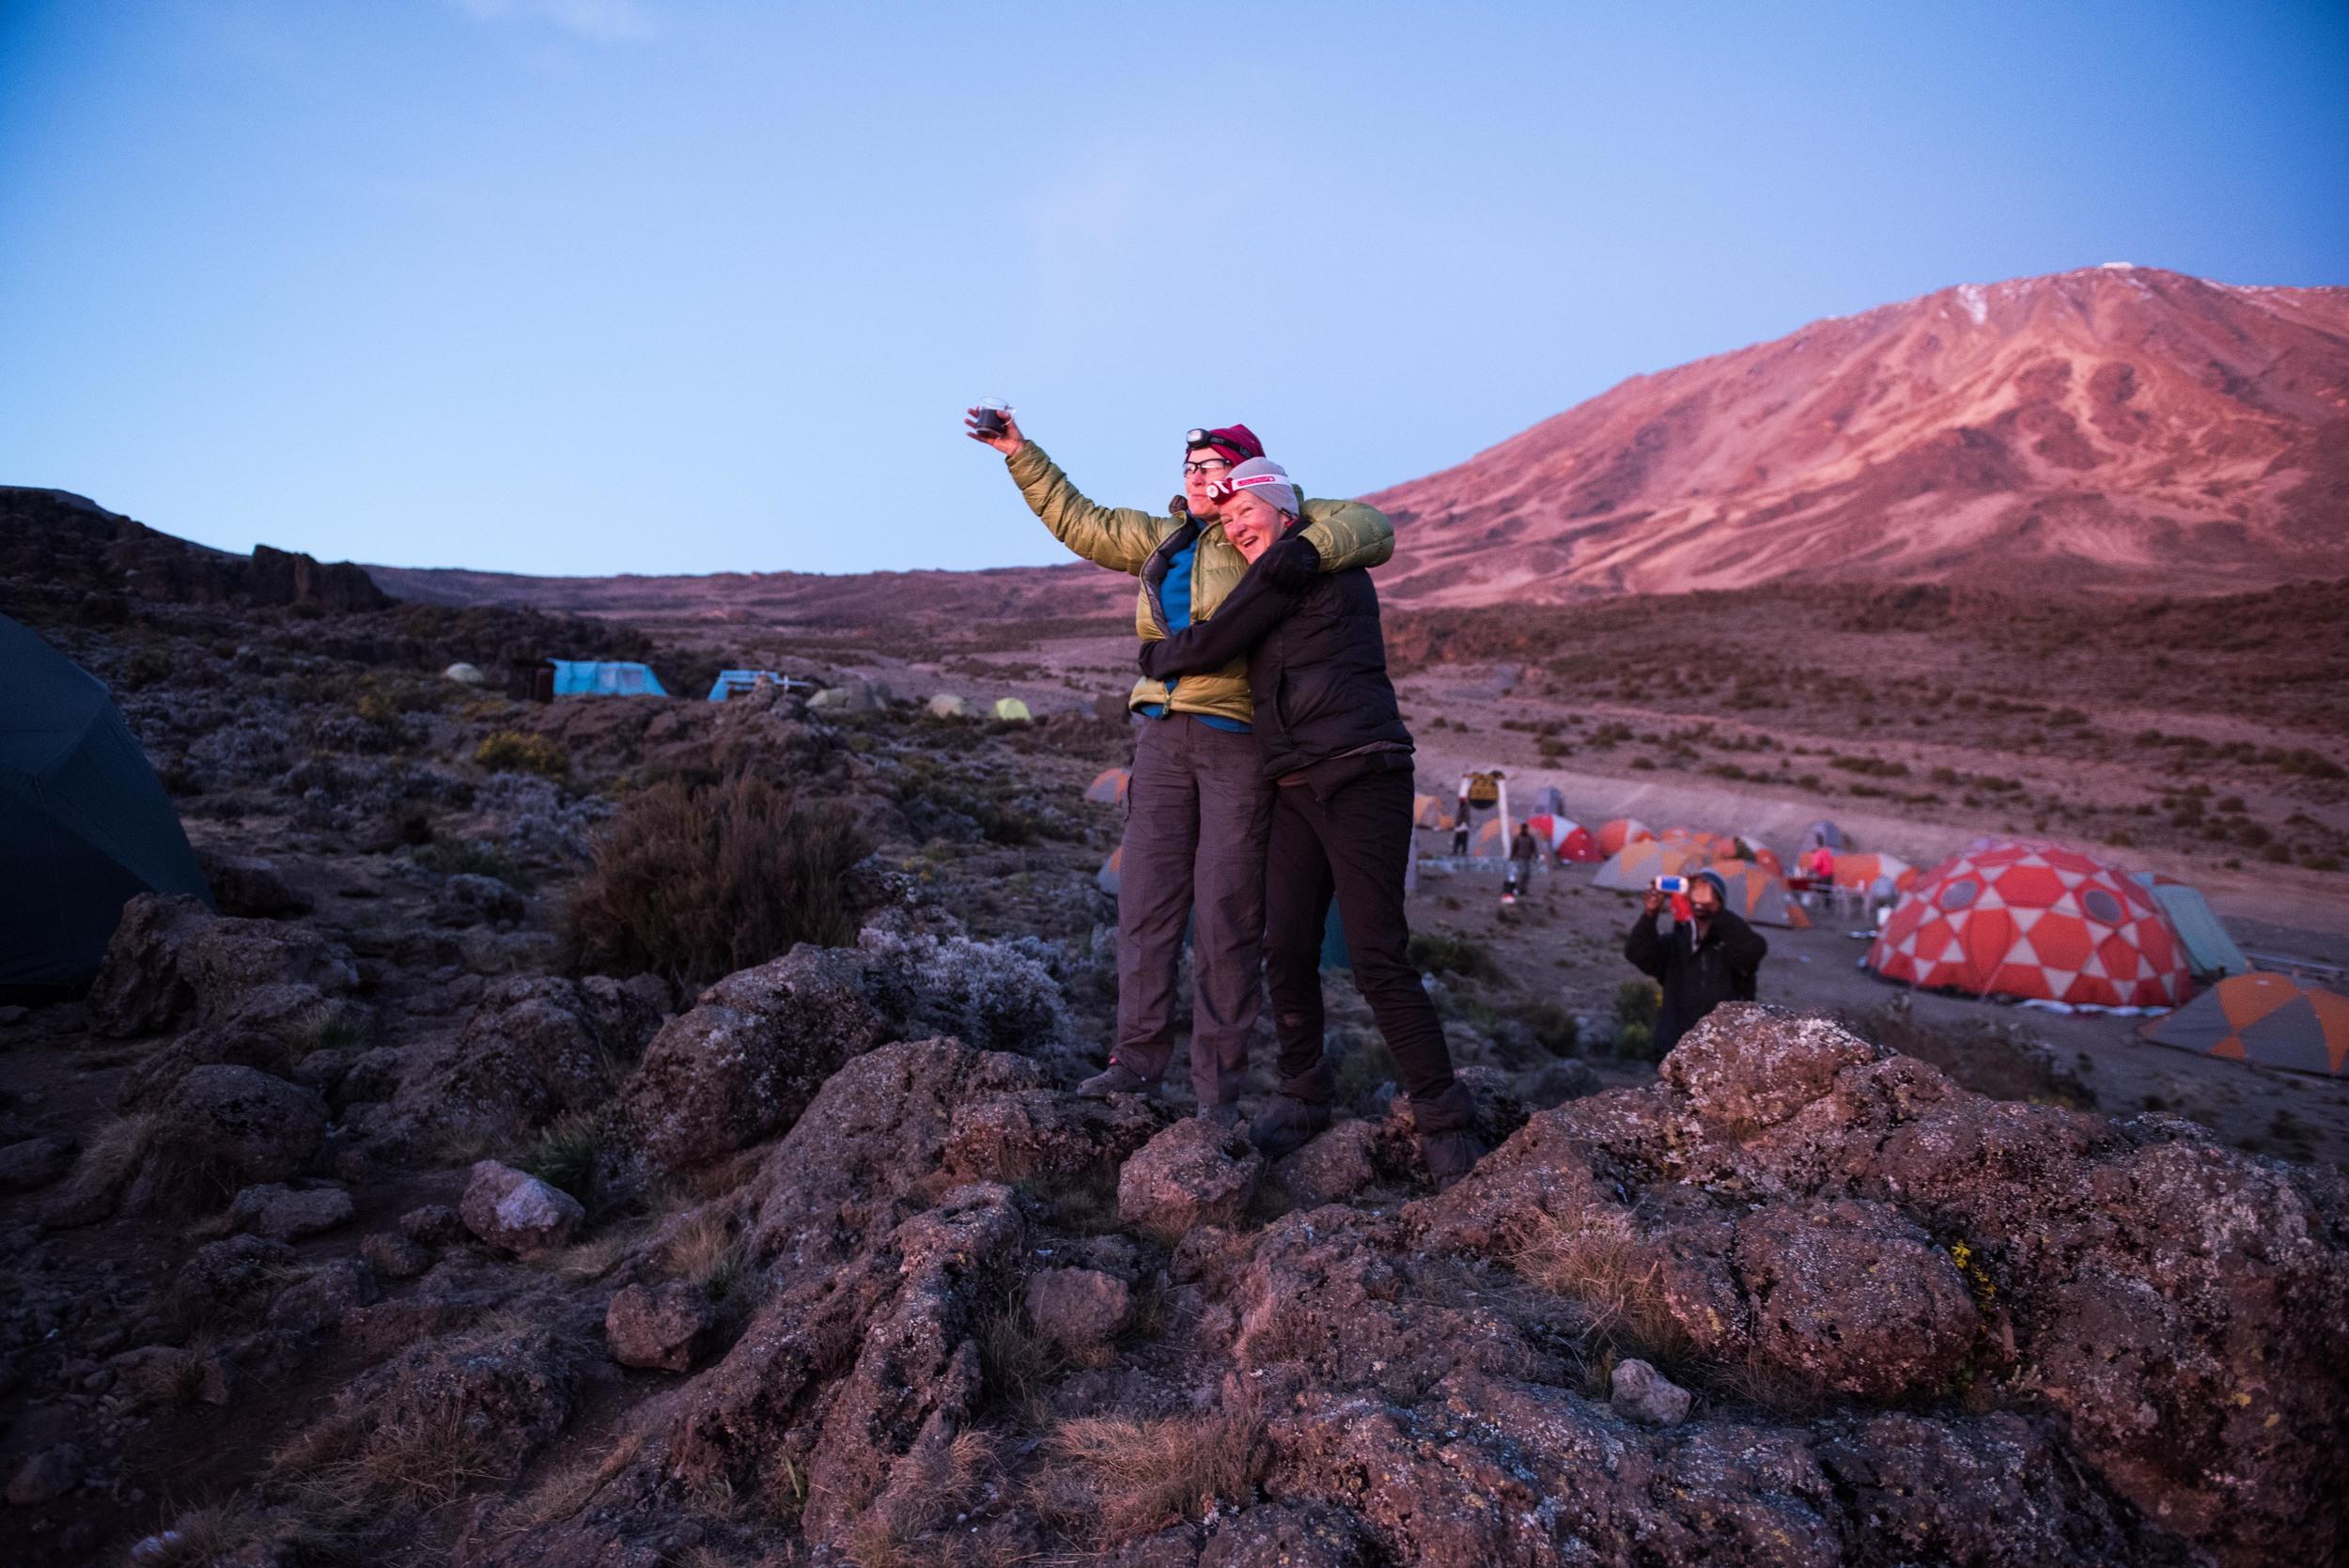 WEB_Kilimanjaro-21.jpg